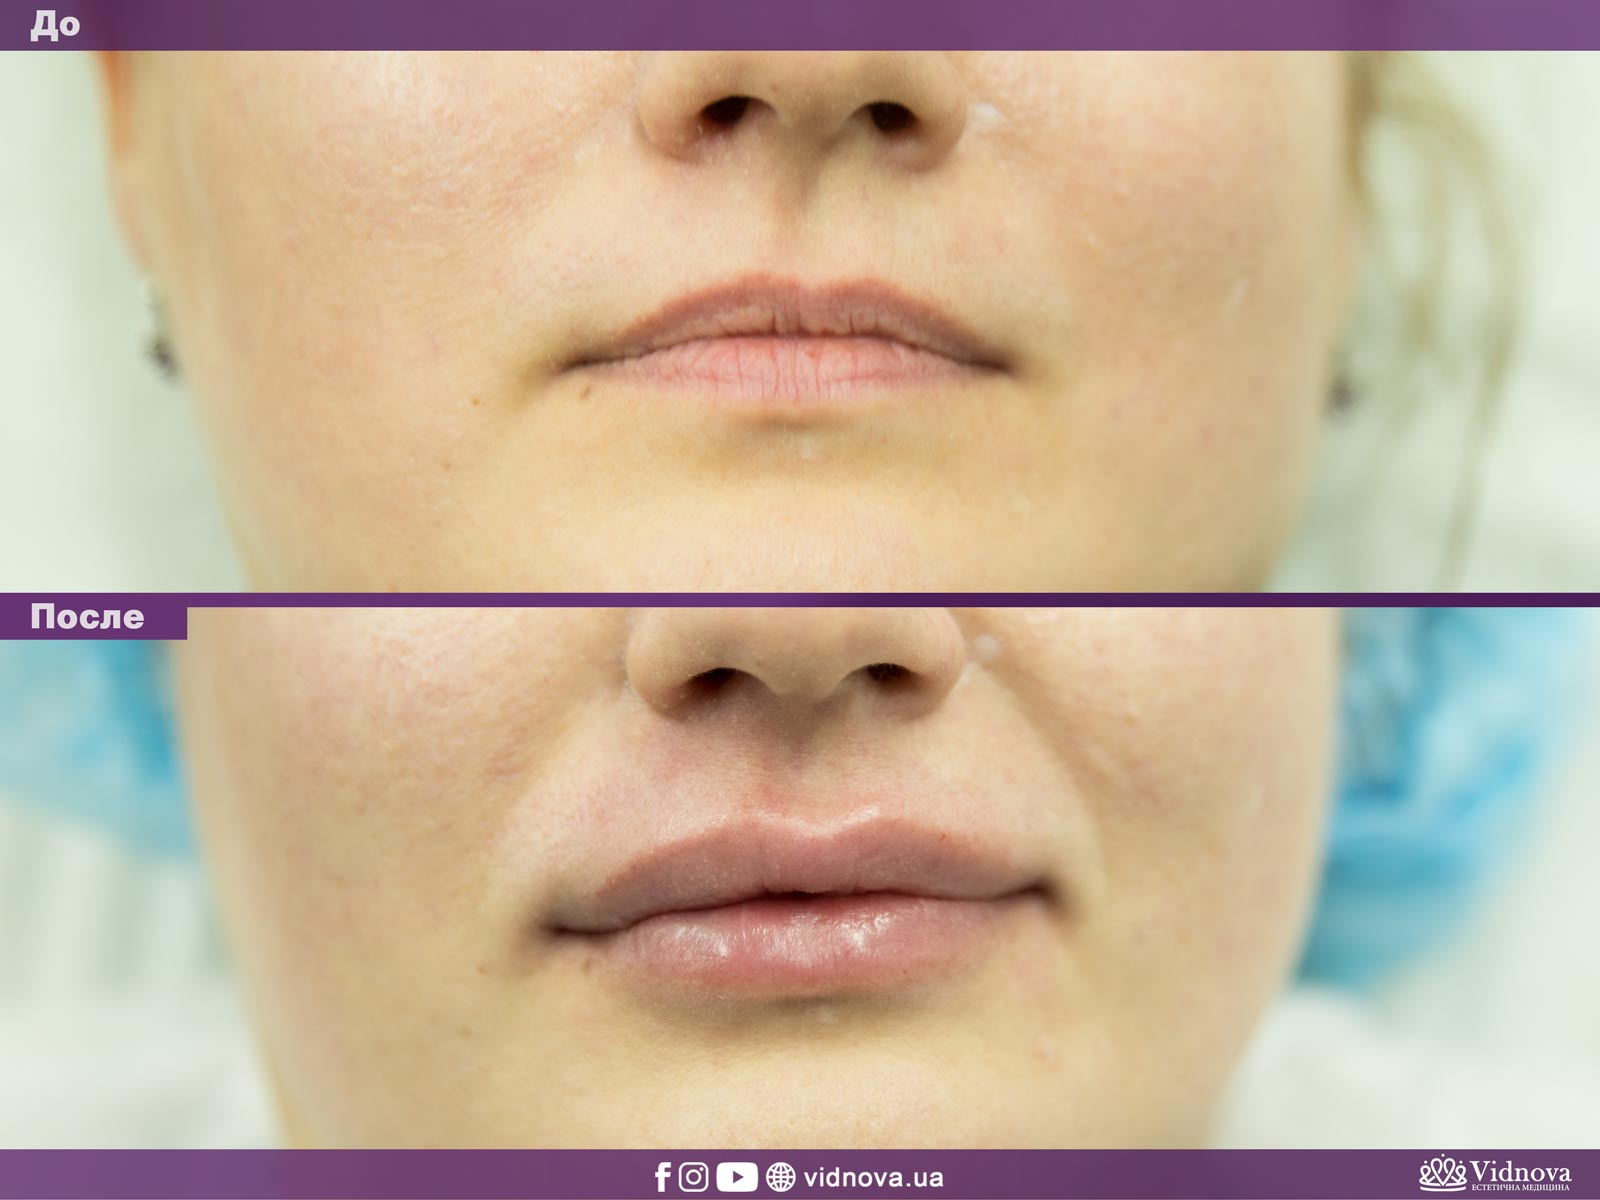 Увеличение губ: Фото До и После - Пример №13-1 - Клиника Vidnova